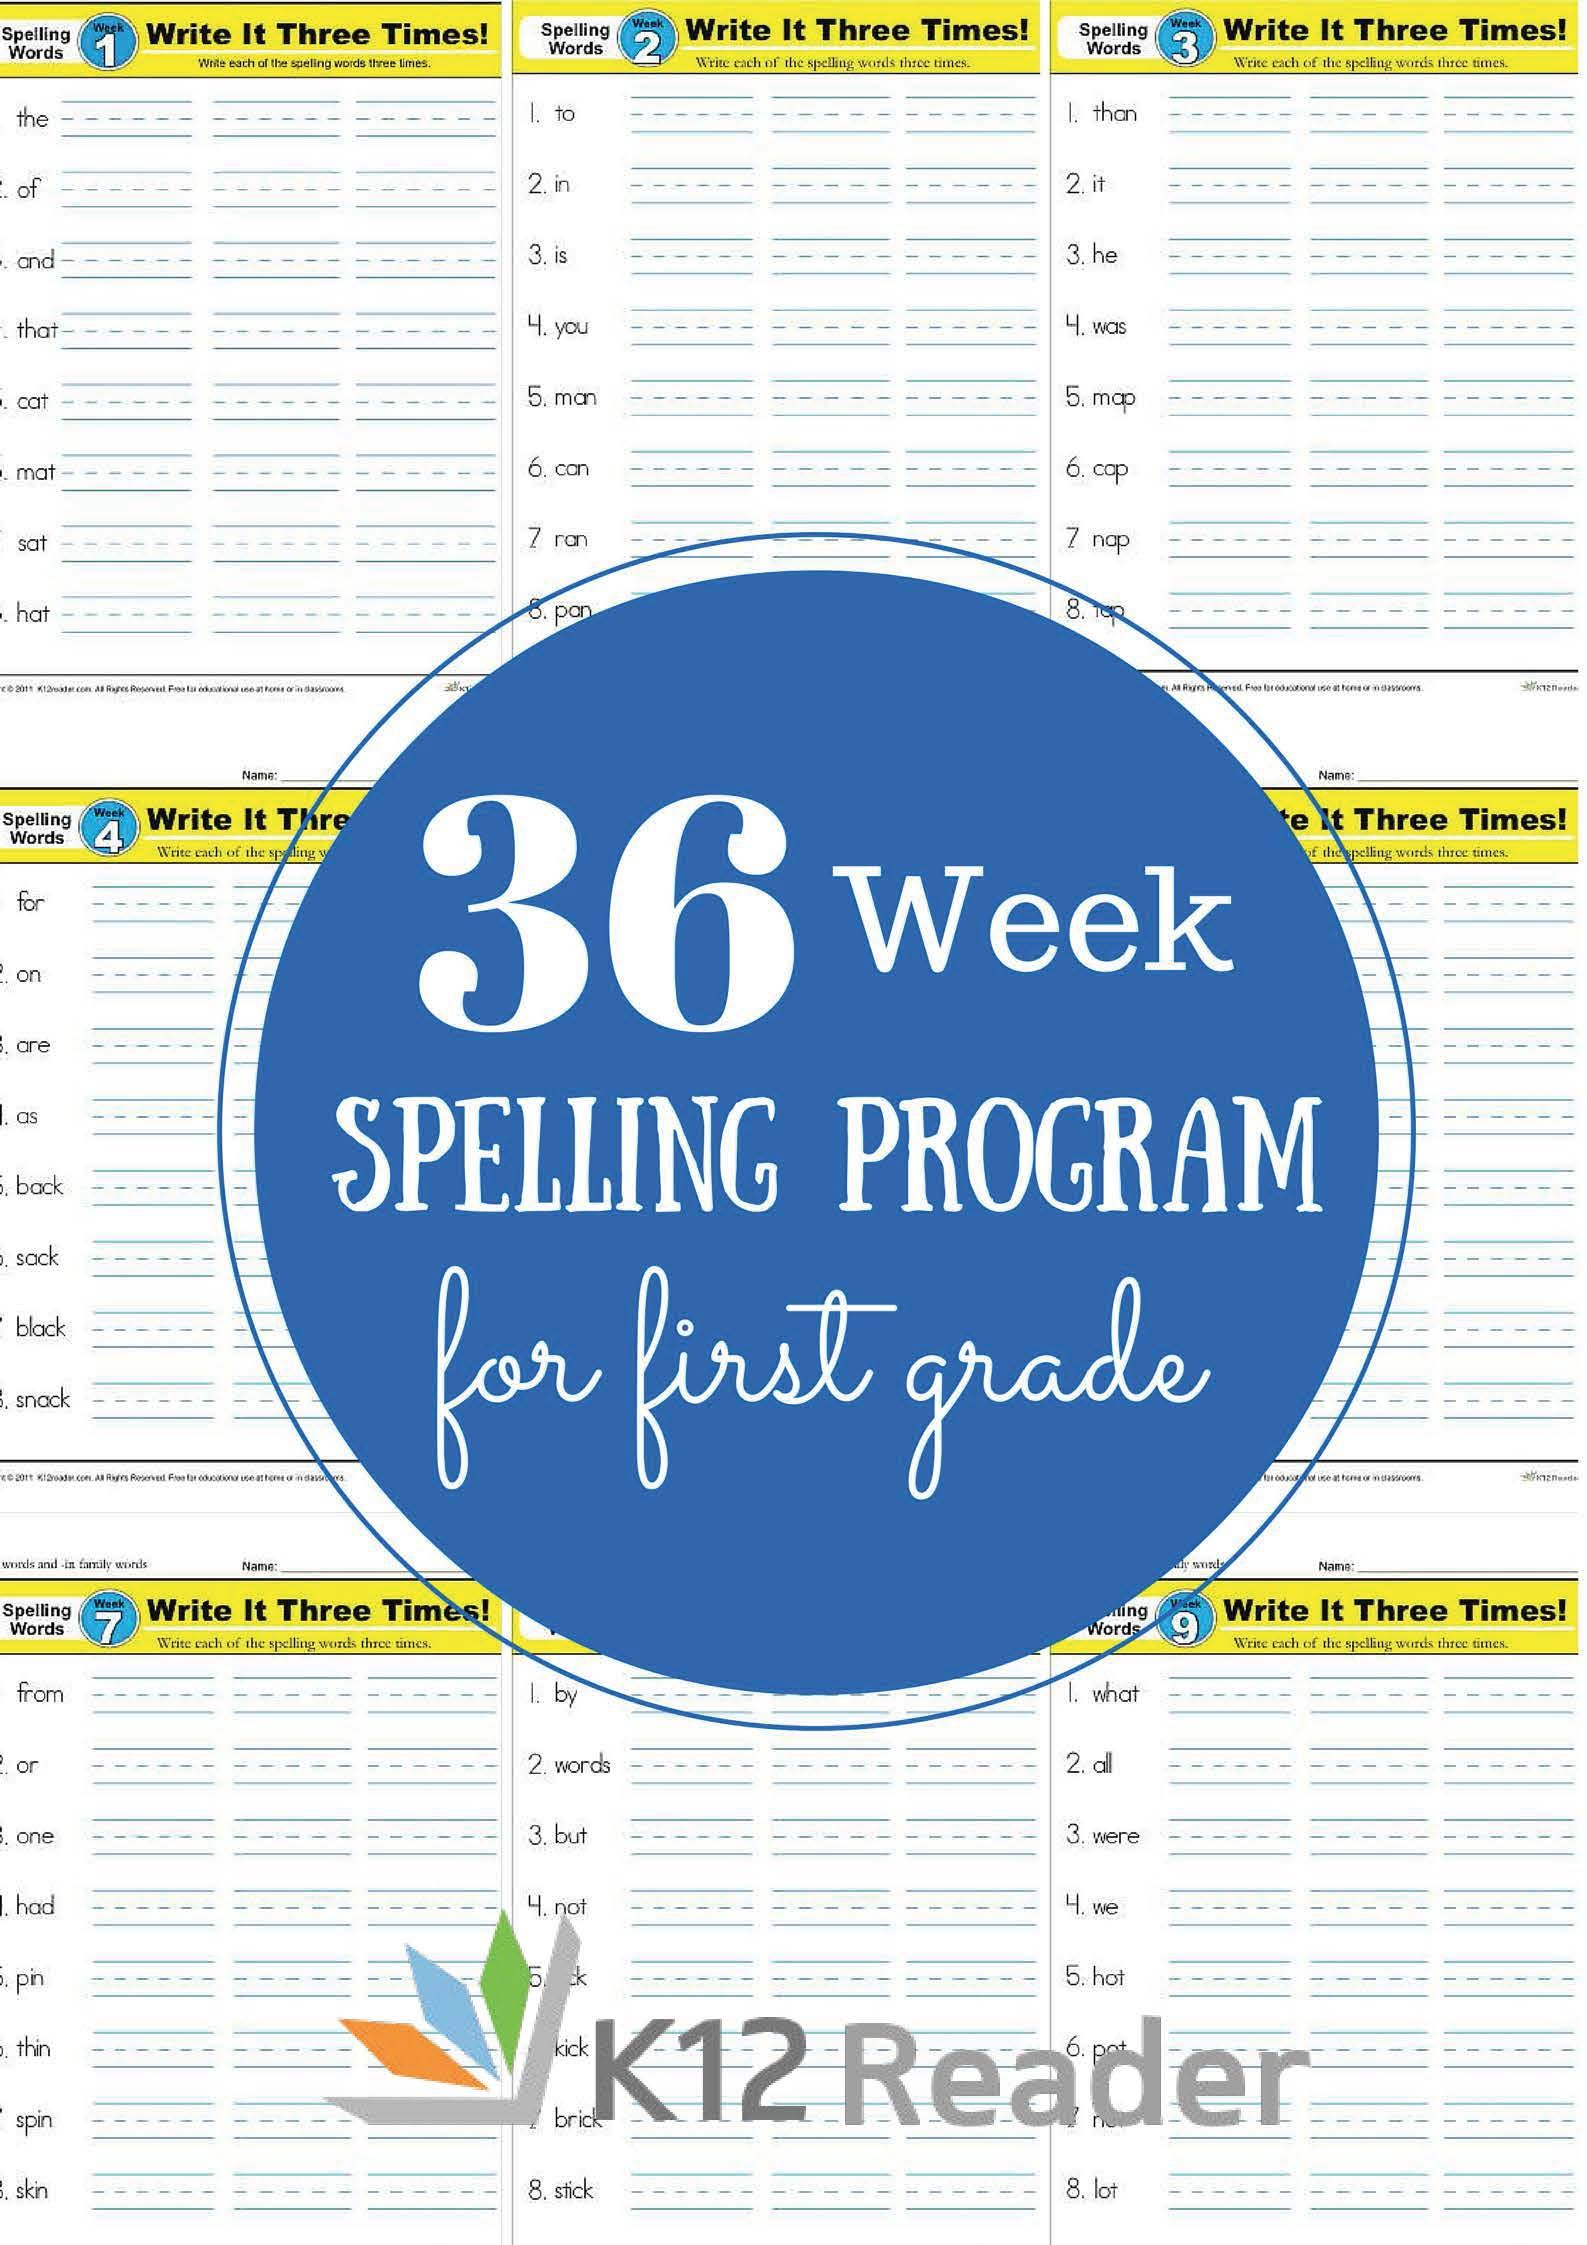 Worksheet Spelling Programs first grade spelling words free 1st weekly list printable 36 week program newly designed for www k12reader